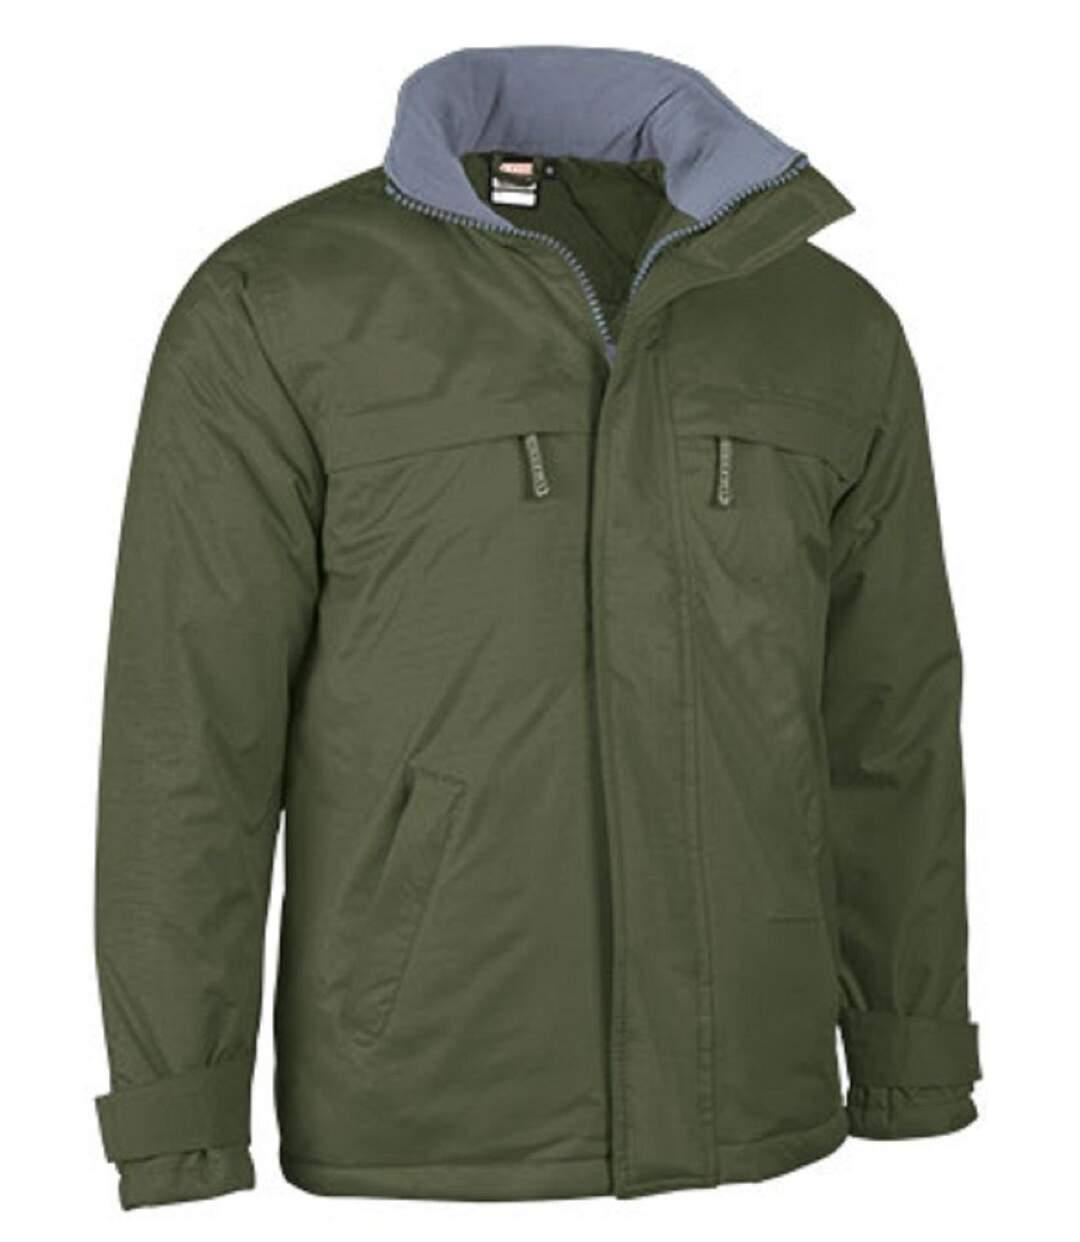 Parka - Homme - REF BOREAL - vert militaire